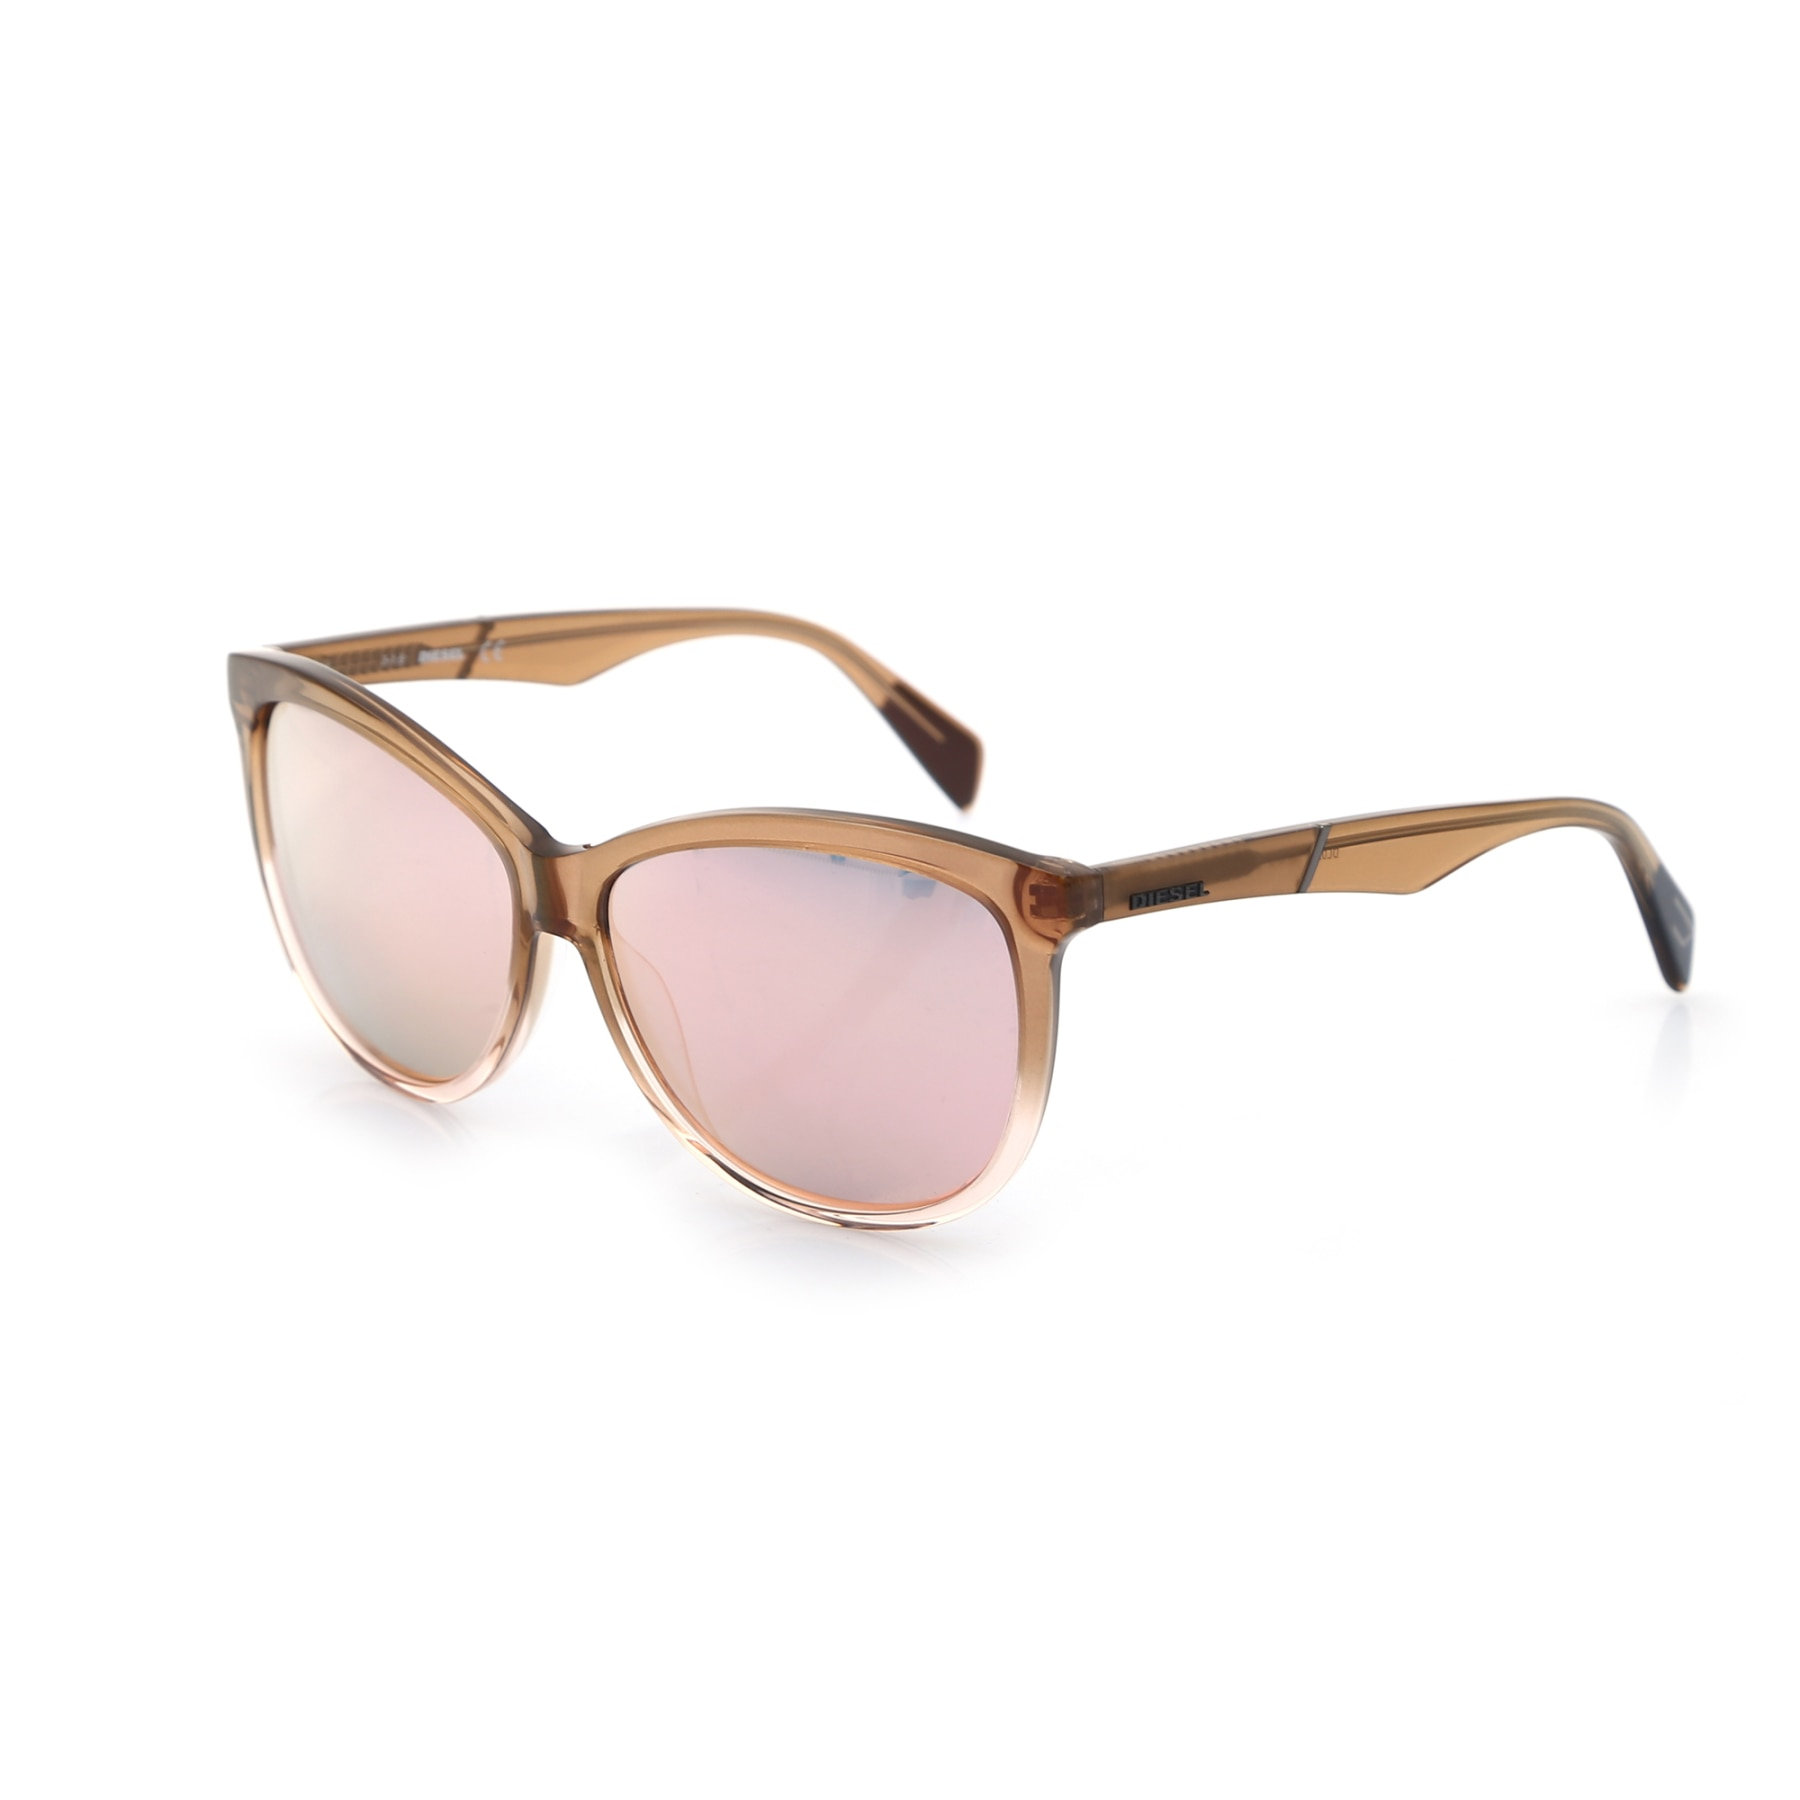 Gafas de sol para mujer dl 0221 77l color hueso orgánico oval aval 59-13-140 diesel